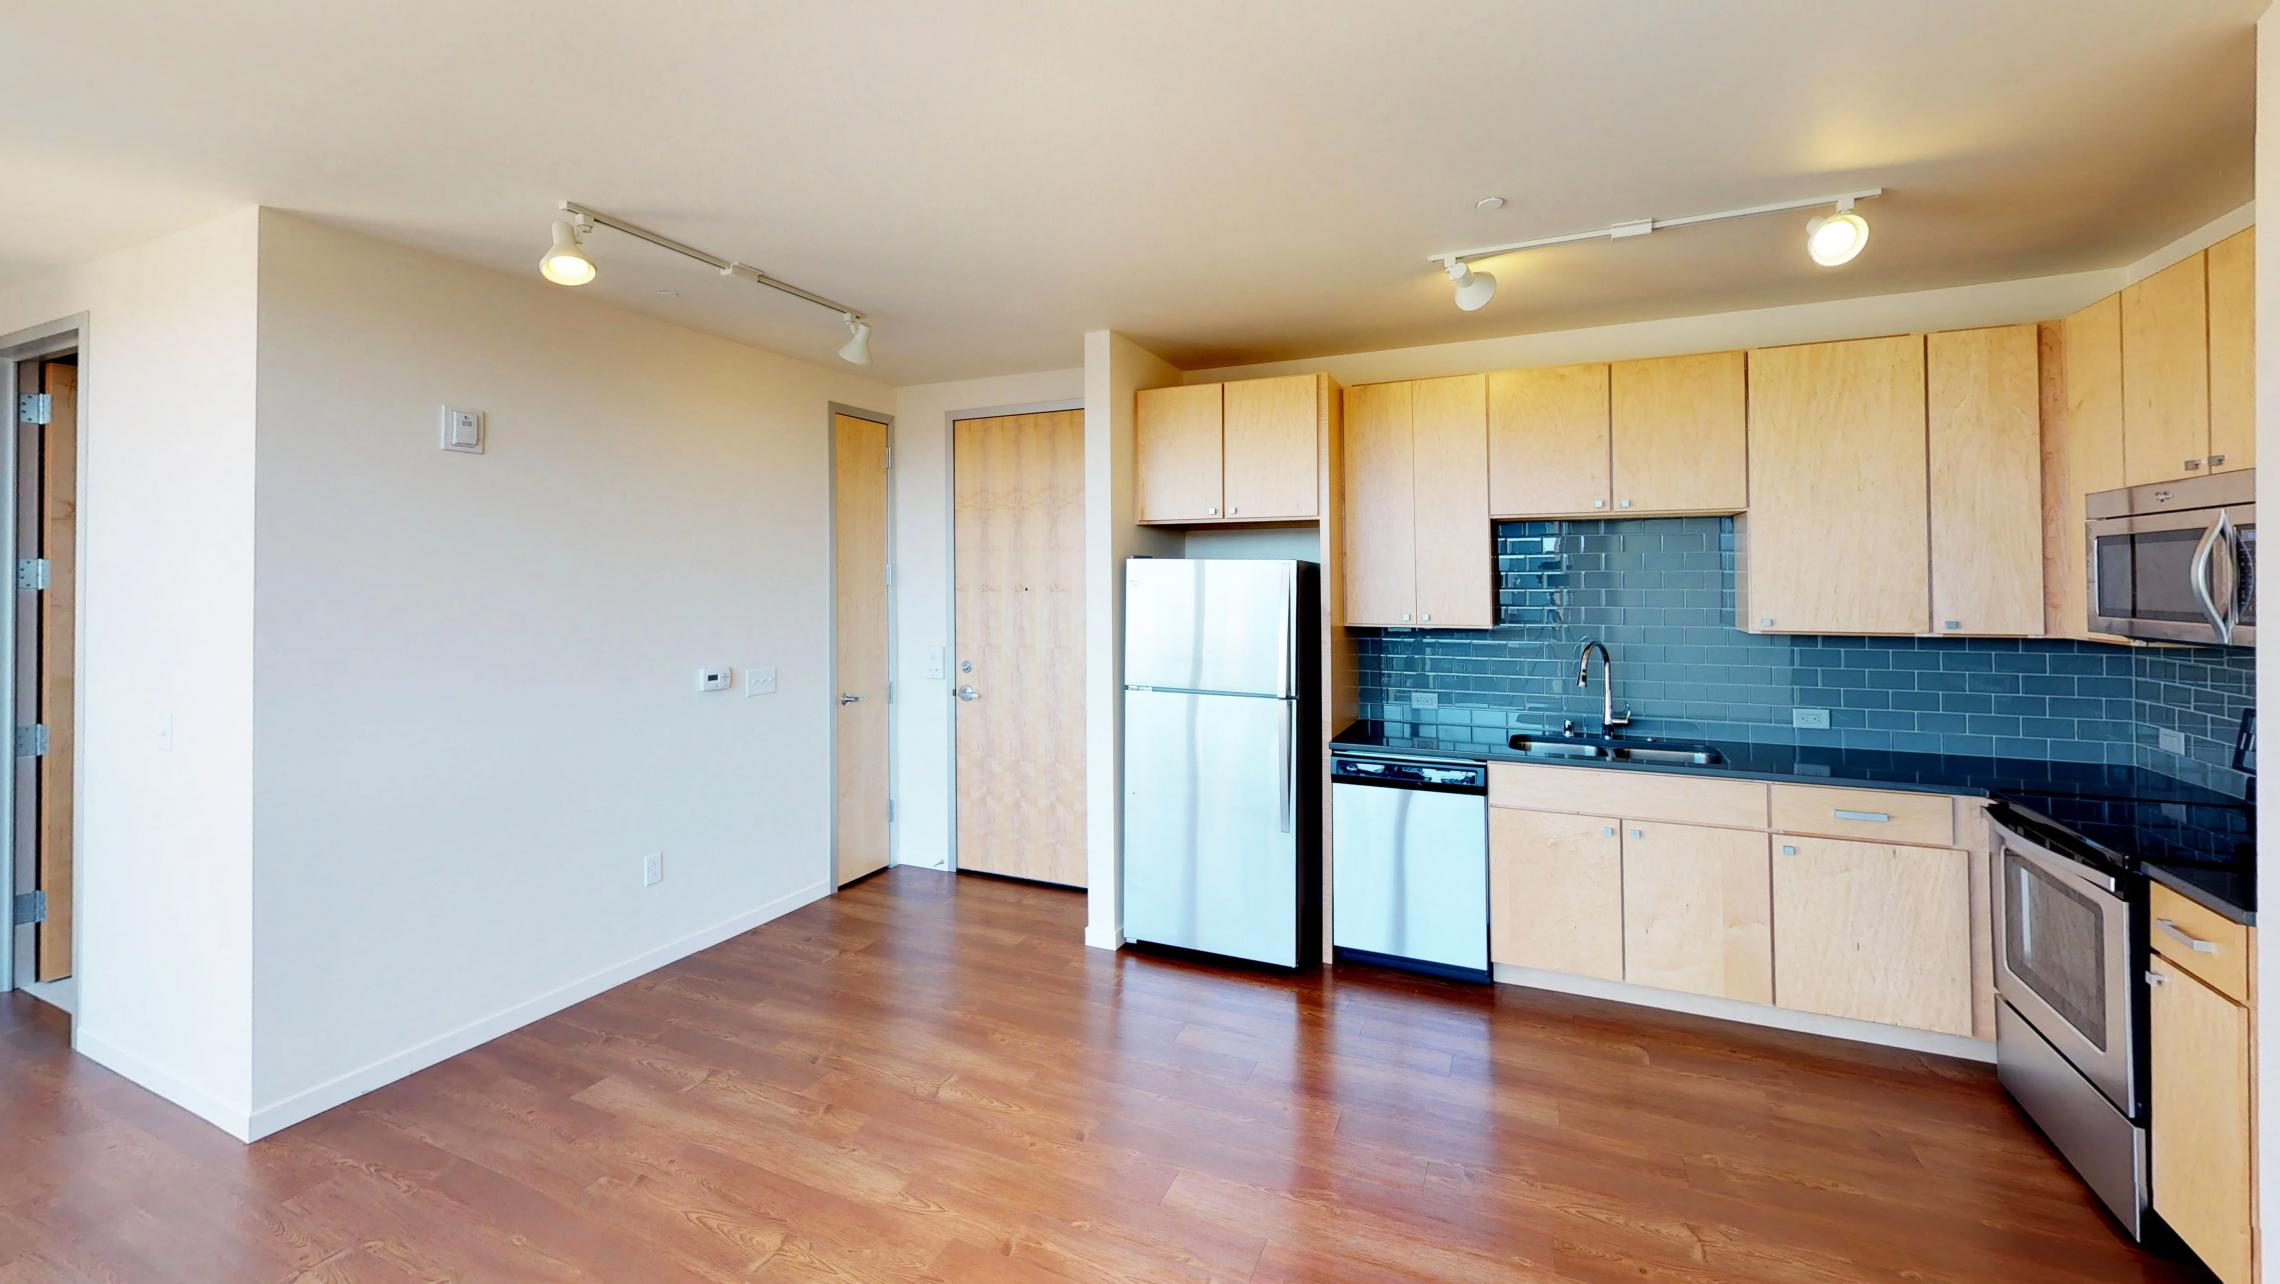 Nine-Line-Apartment-kitchen-upscale-modern-luxury-design-madison-lifestyle-balcony-downtown-capitol.jpg